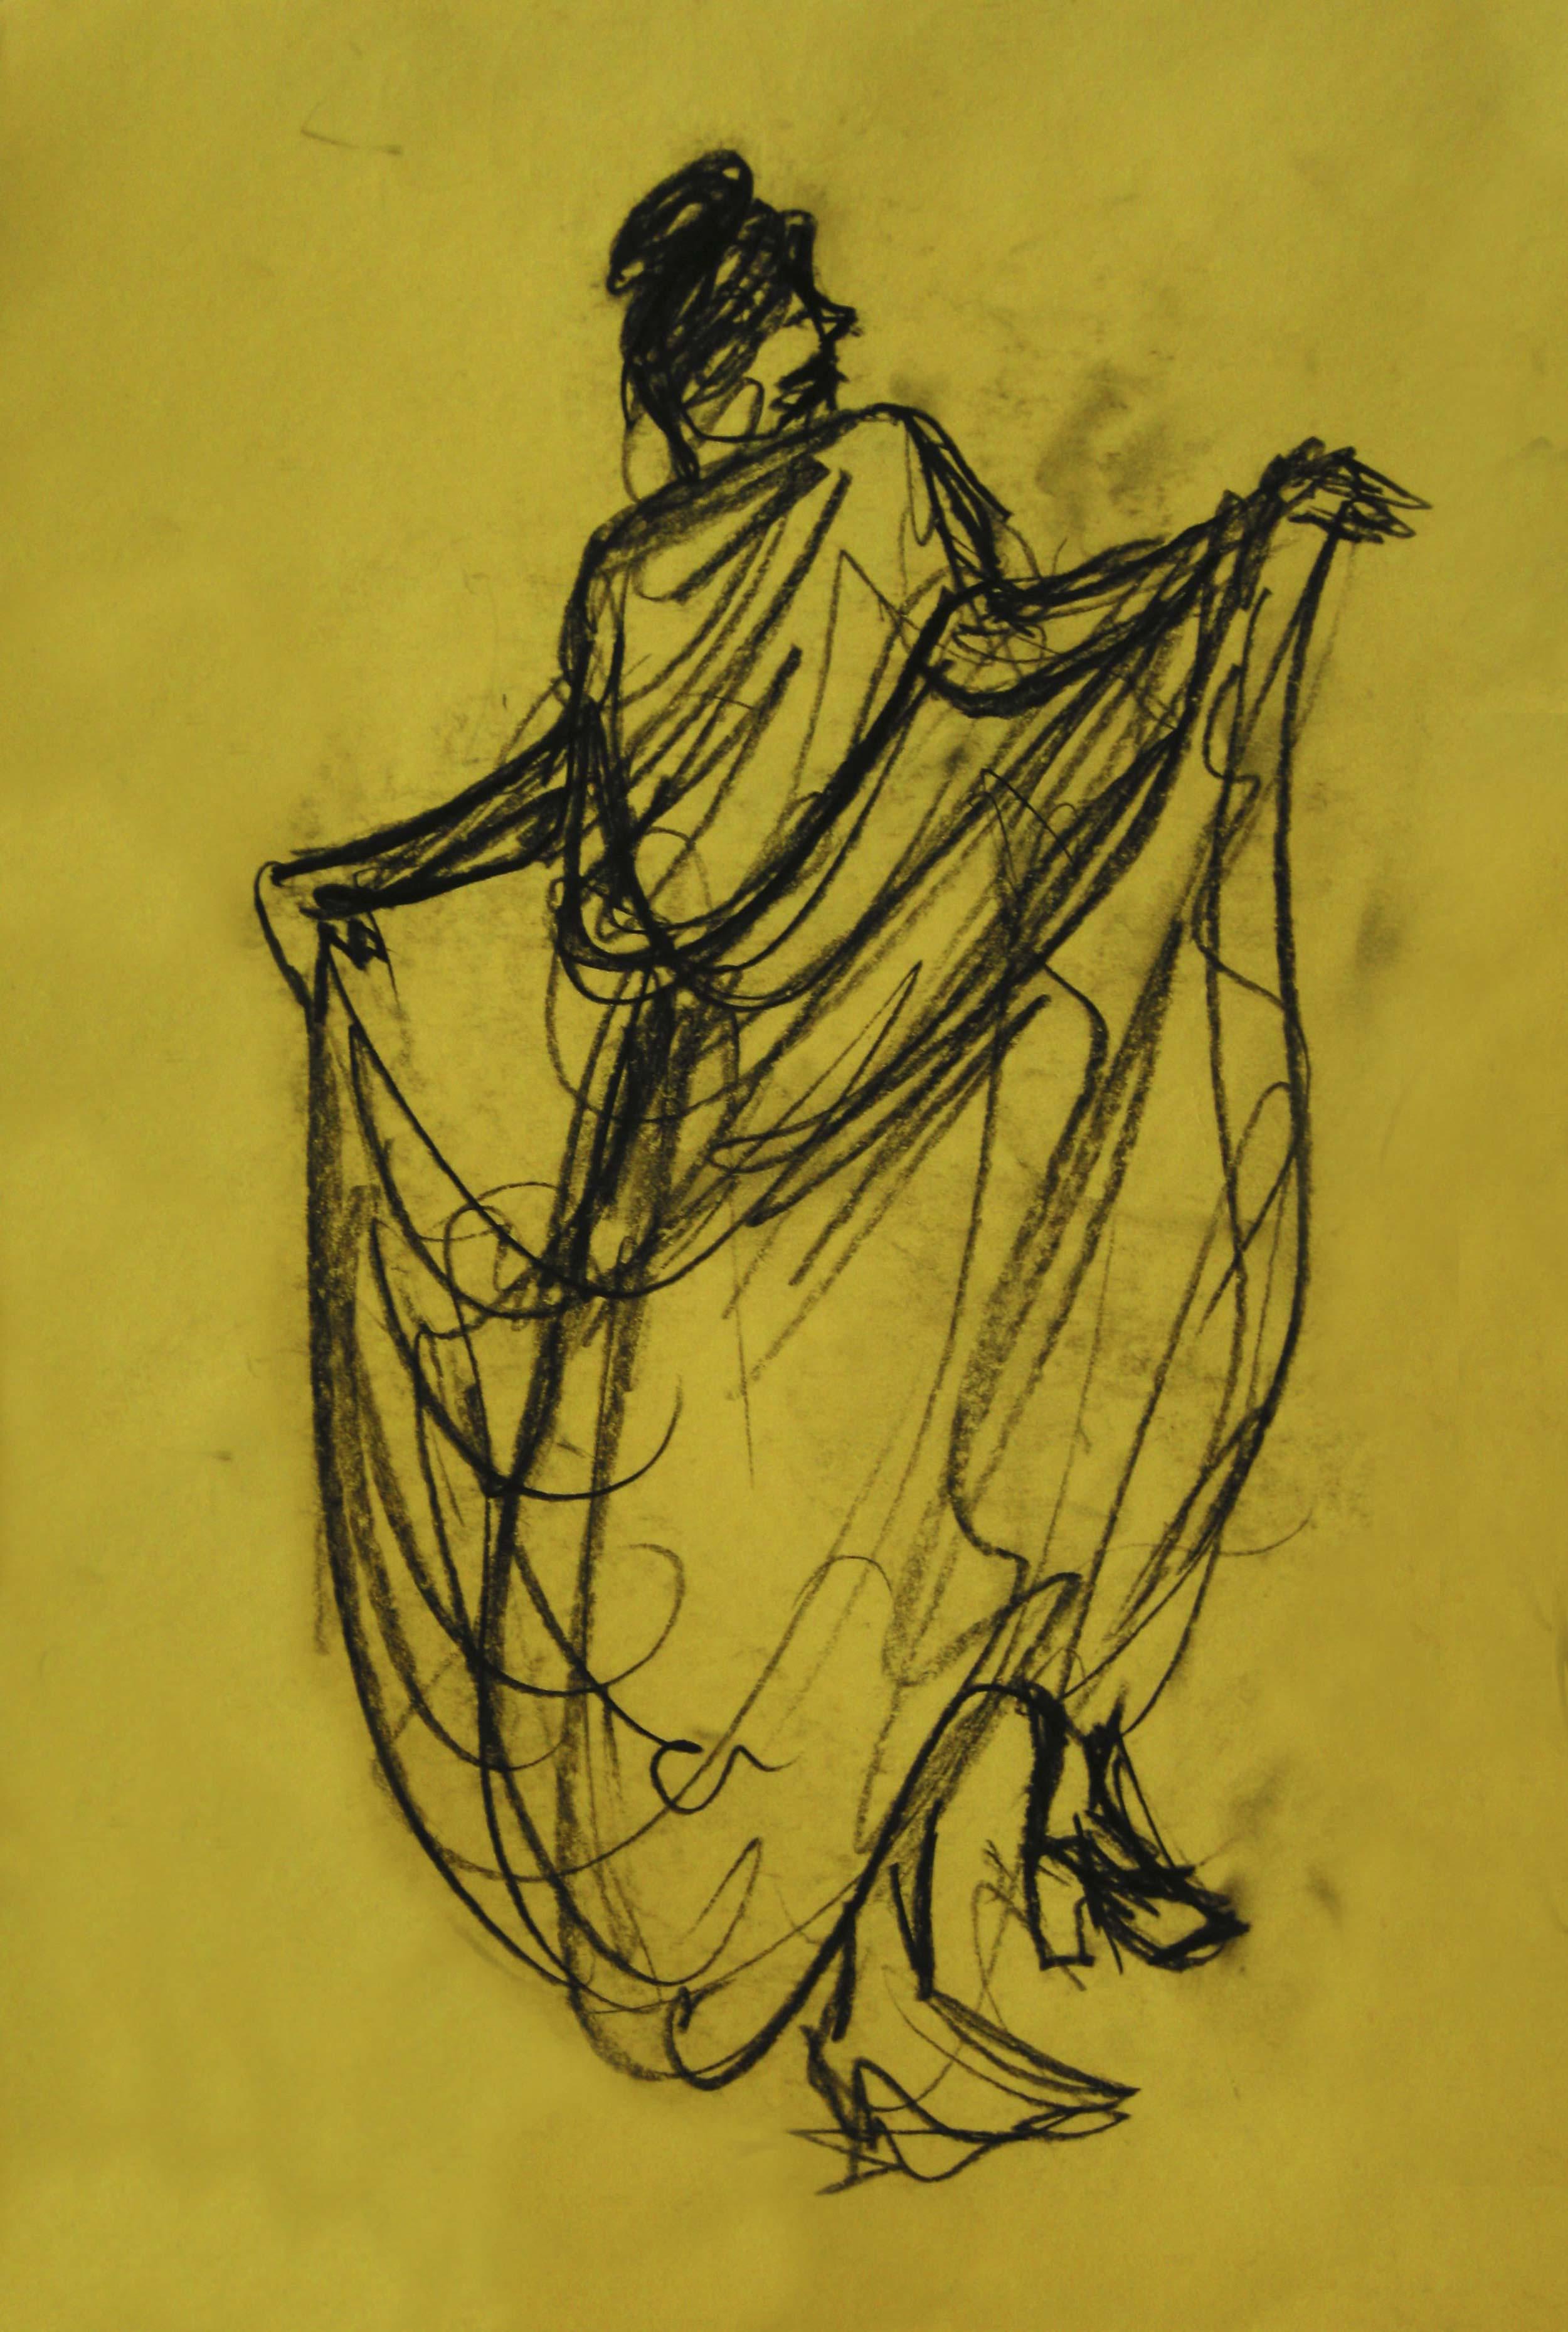 FANDANGO  Charcoal on paper |32 x 41 cm | 2008